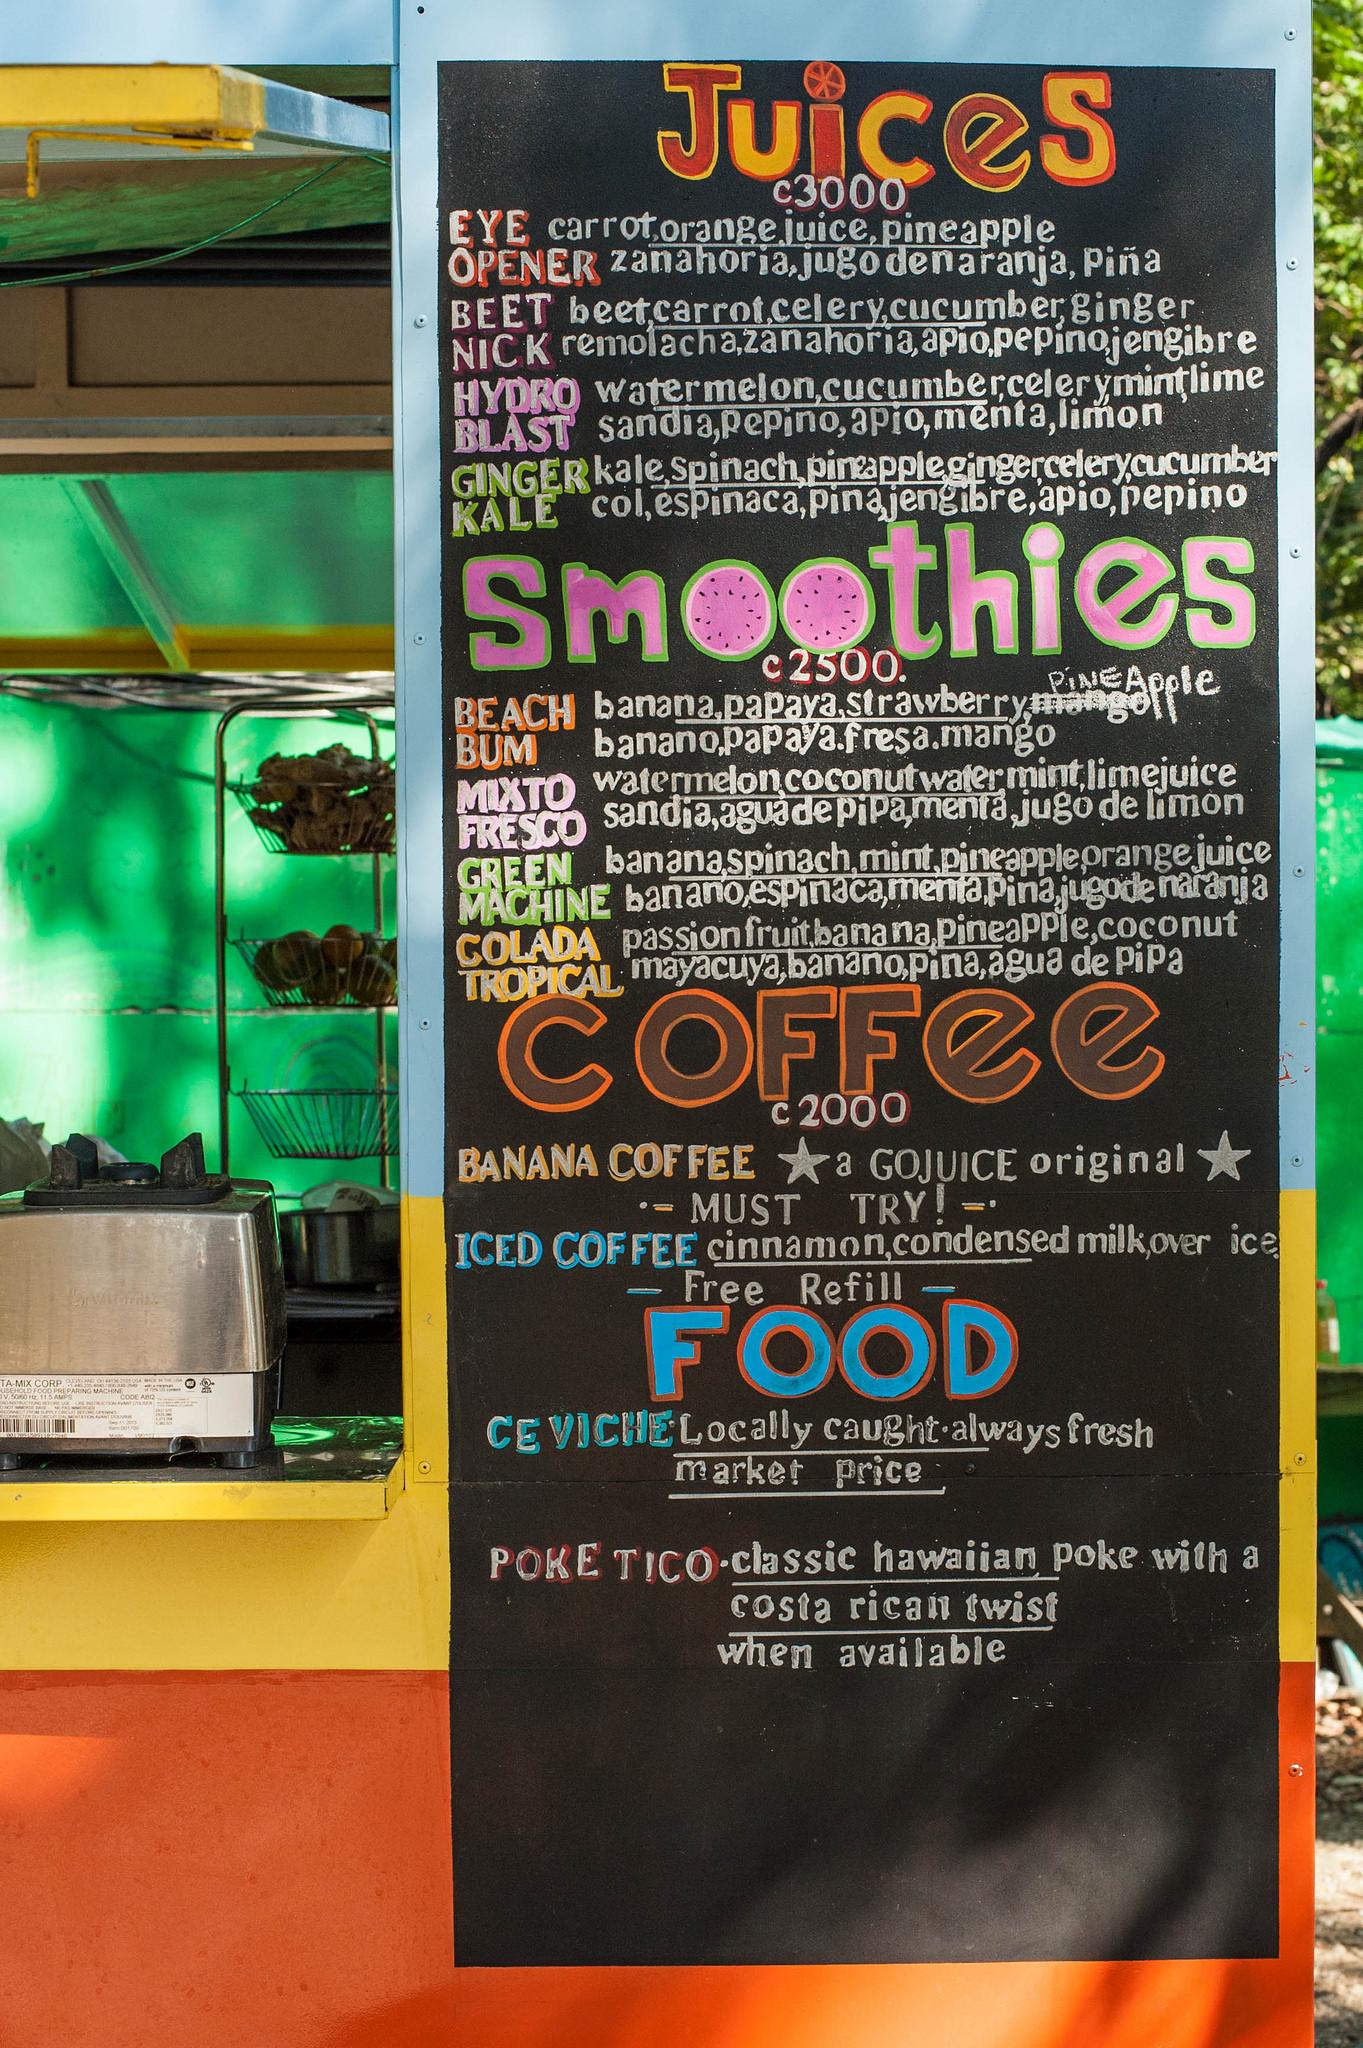 go-juice-menu-nosara-costa-rica